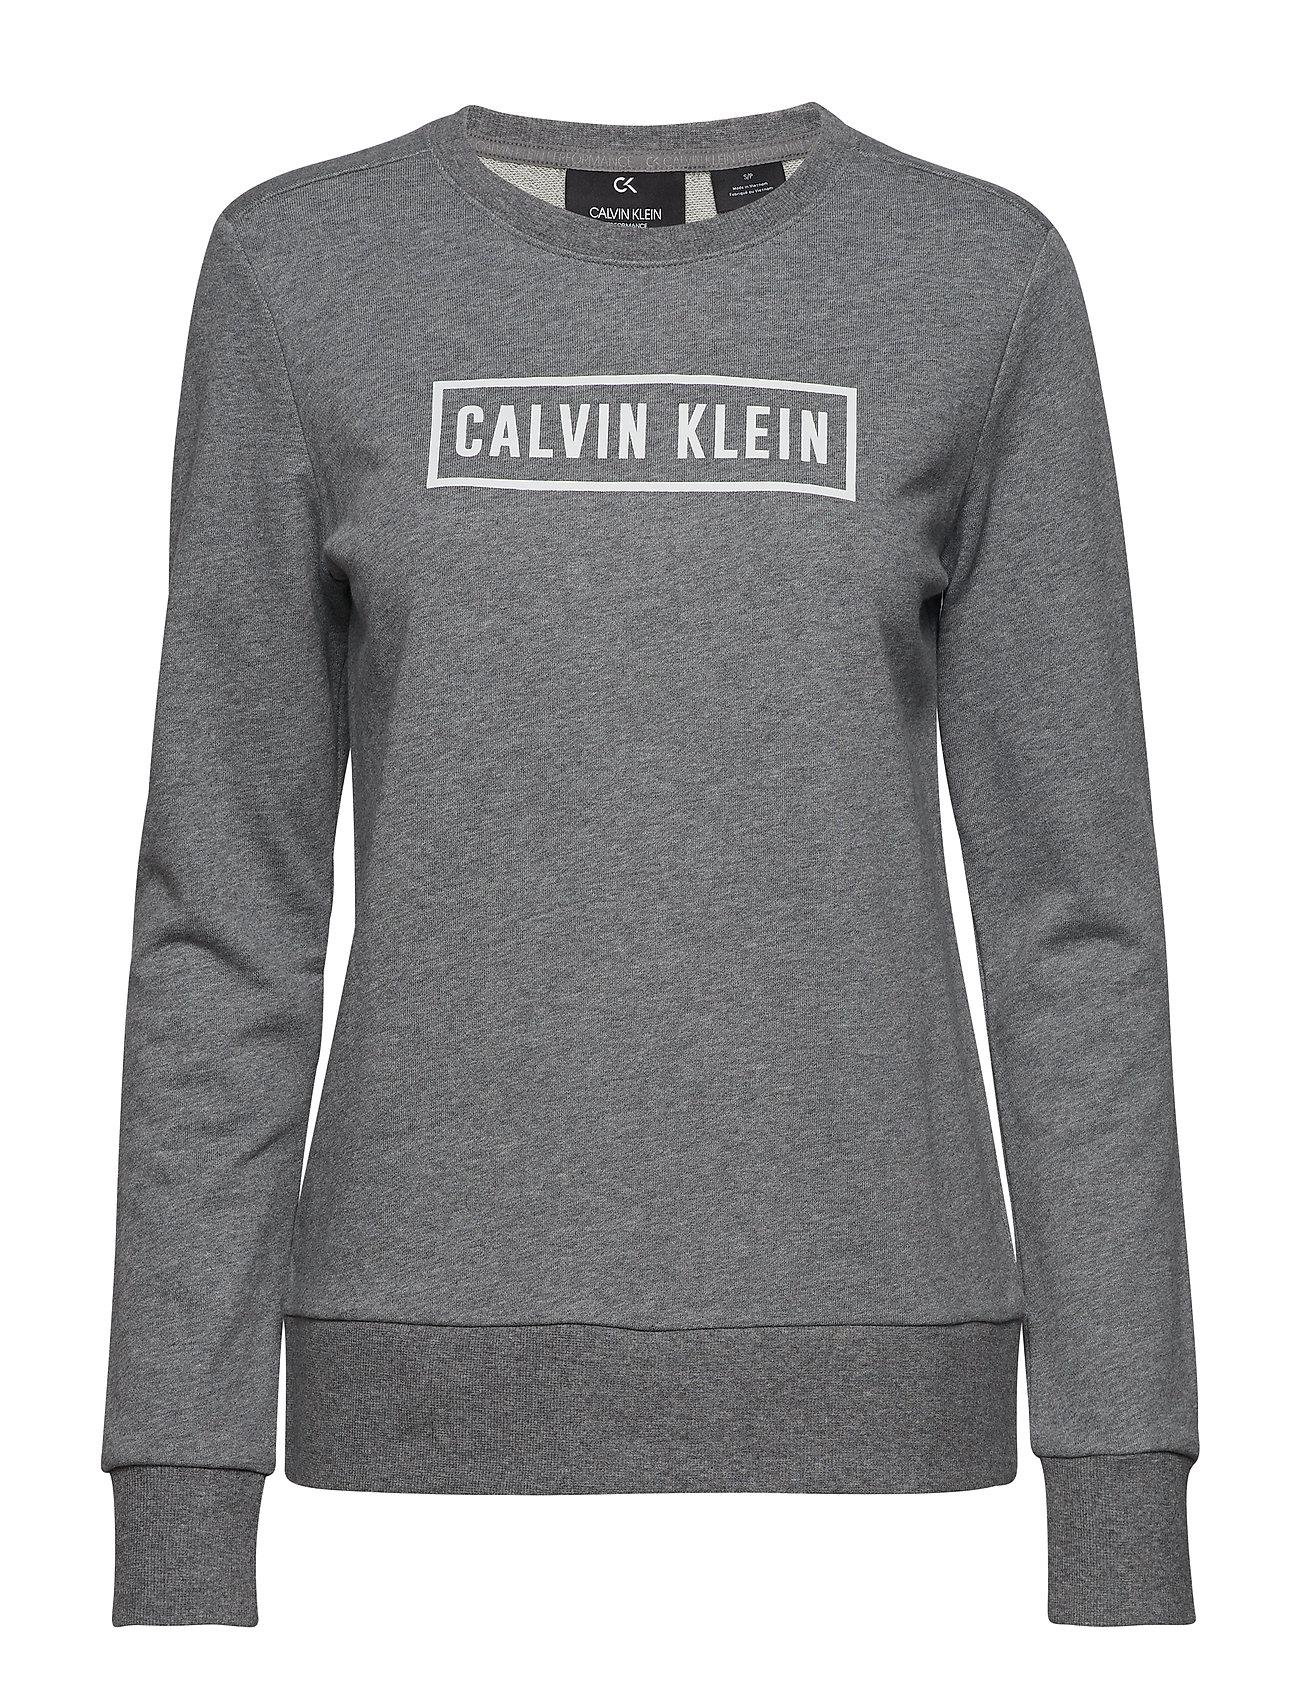 Image of Pullover Sweatshirt Trøje Grå CALVIN KLEIN PERFORMANCE (3220986681)